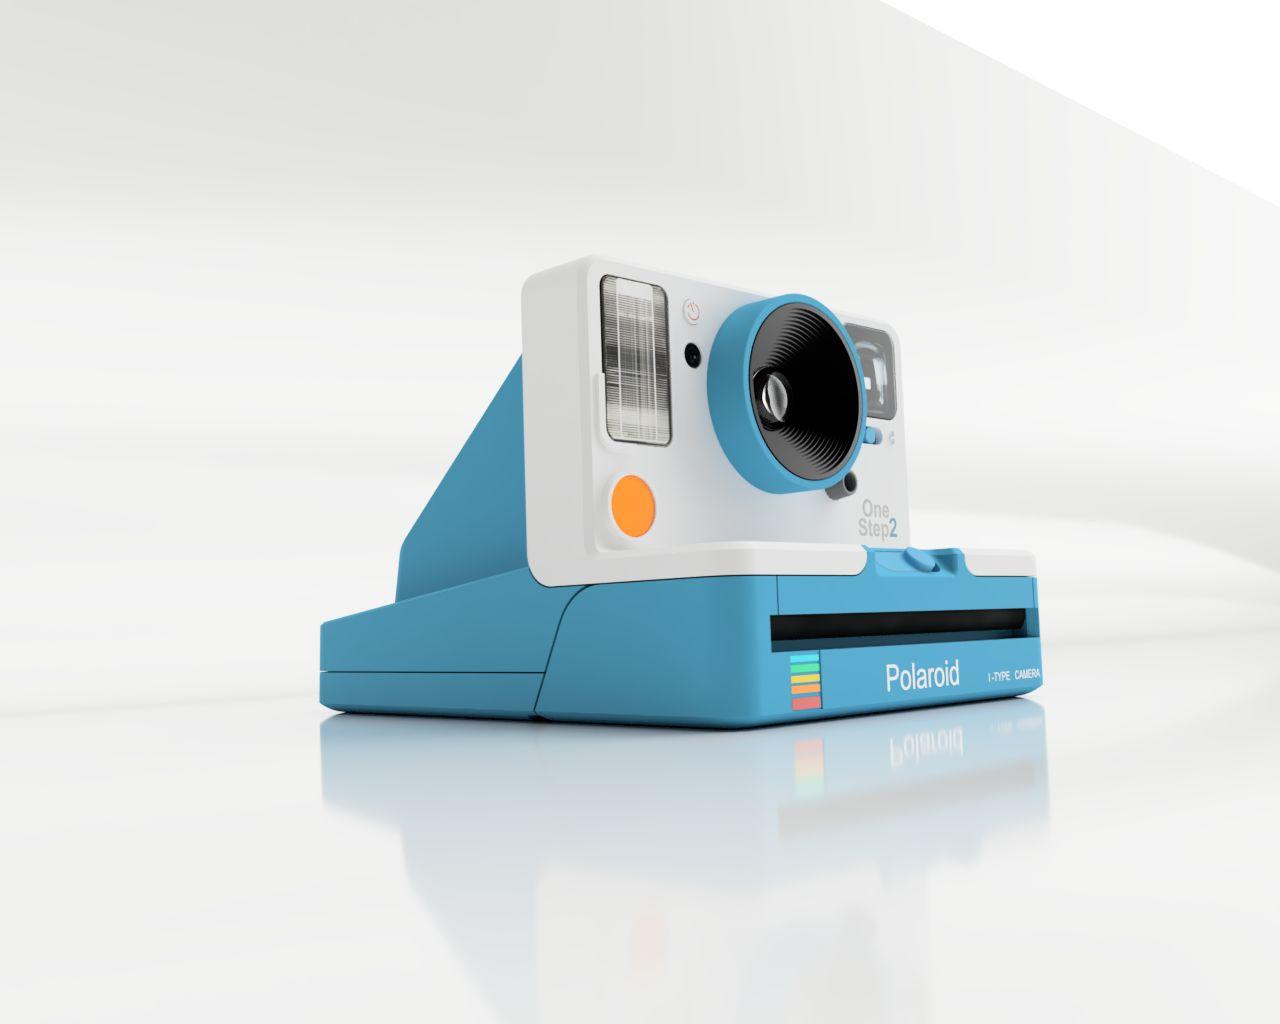 Polaroid-onestep-2-2020-feb-19-10-21-29pm-000-customizedview5635298932-3500-3500